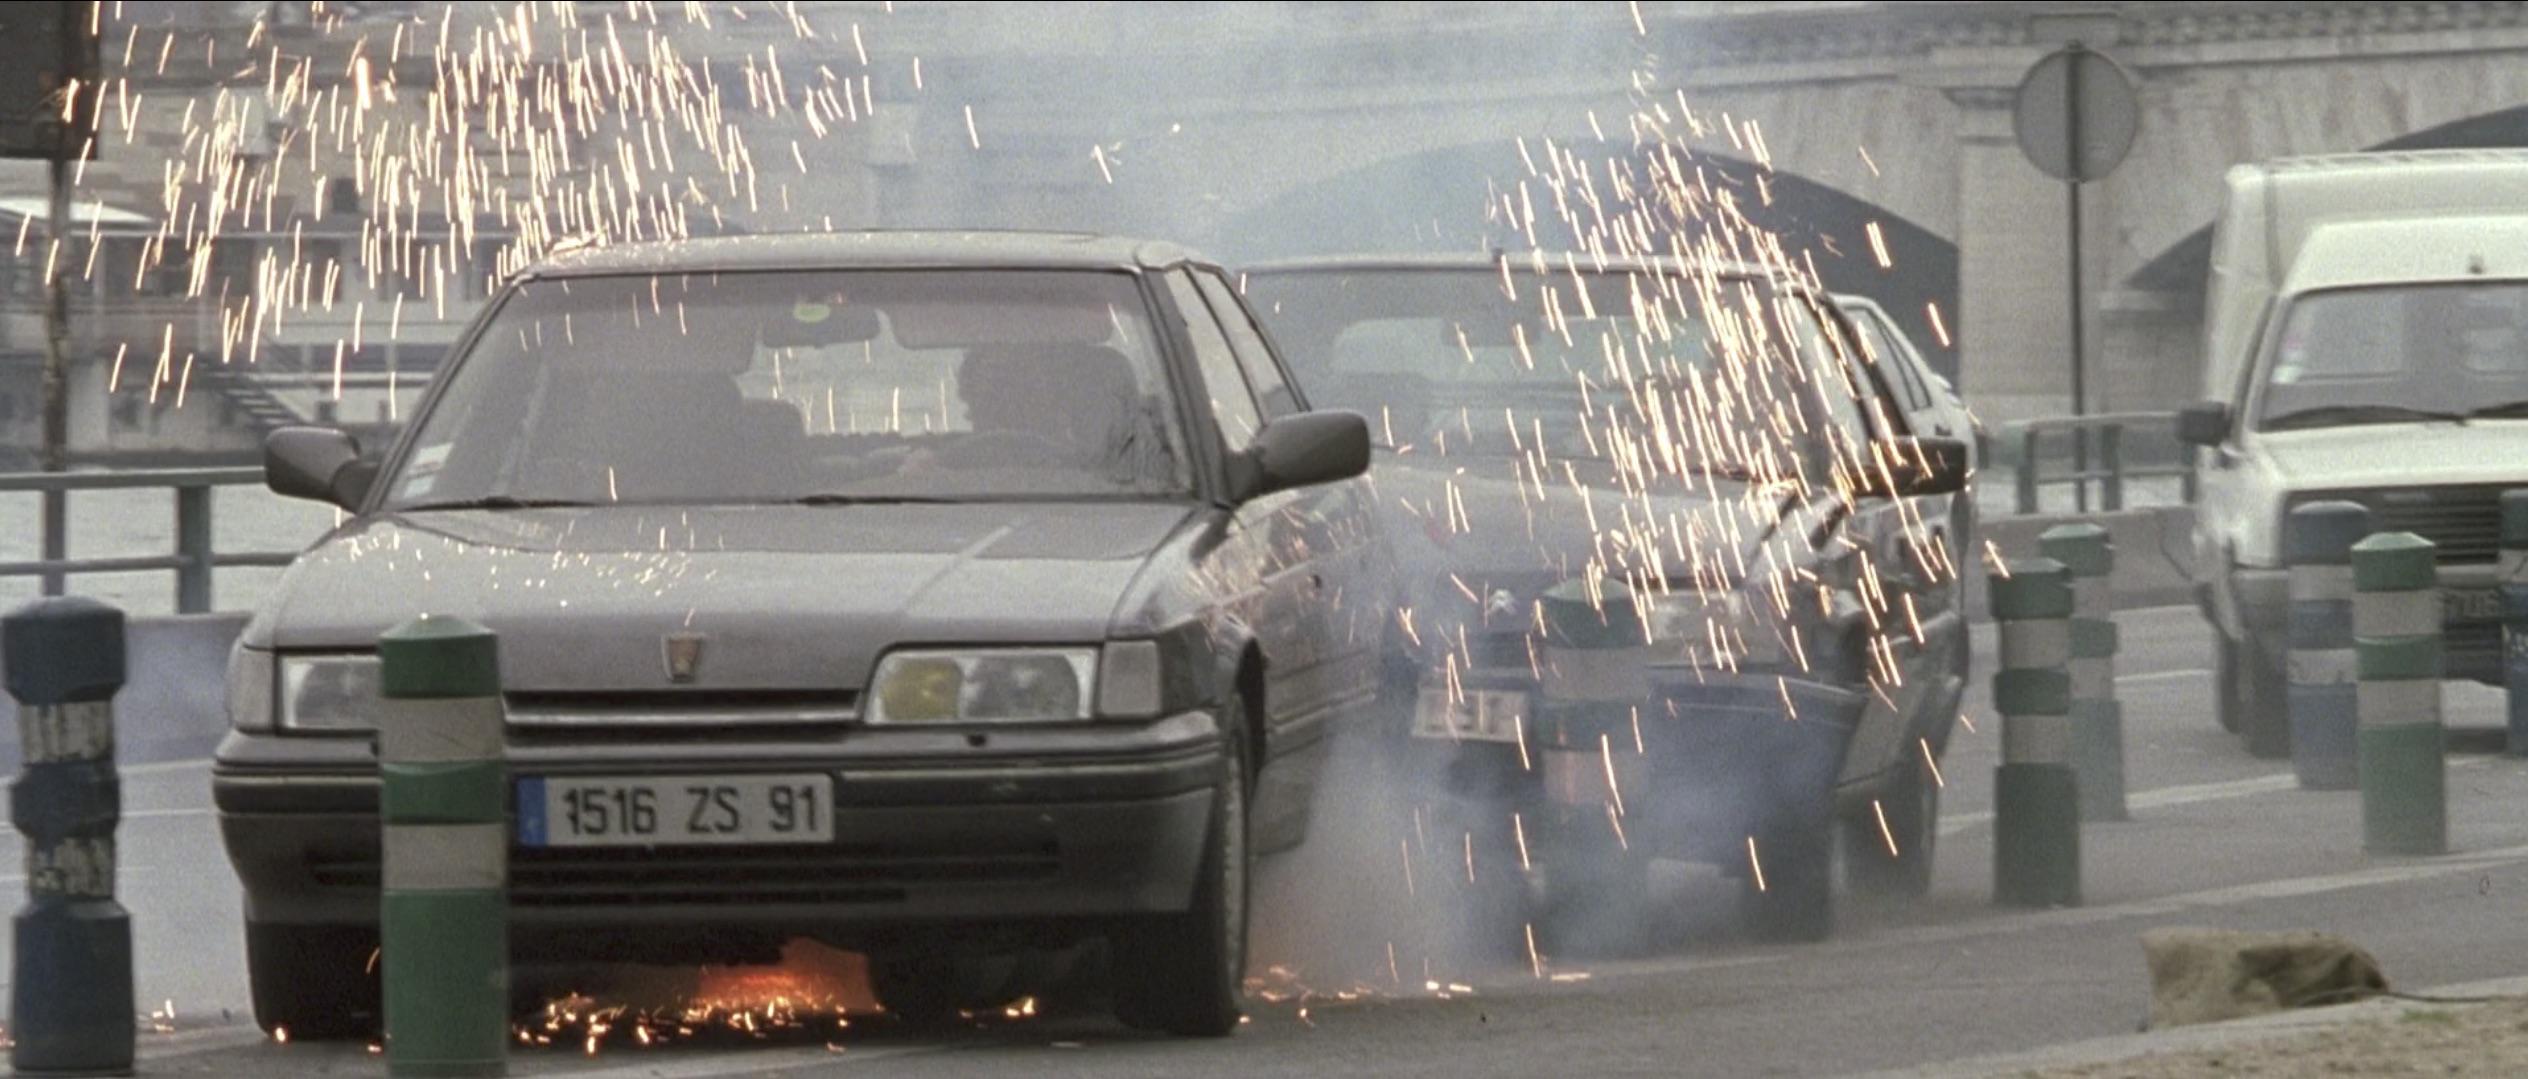 Ronin car chase sparks